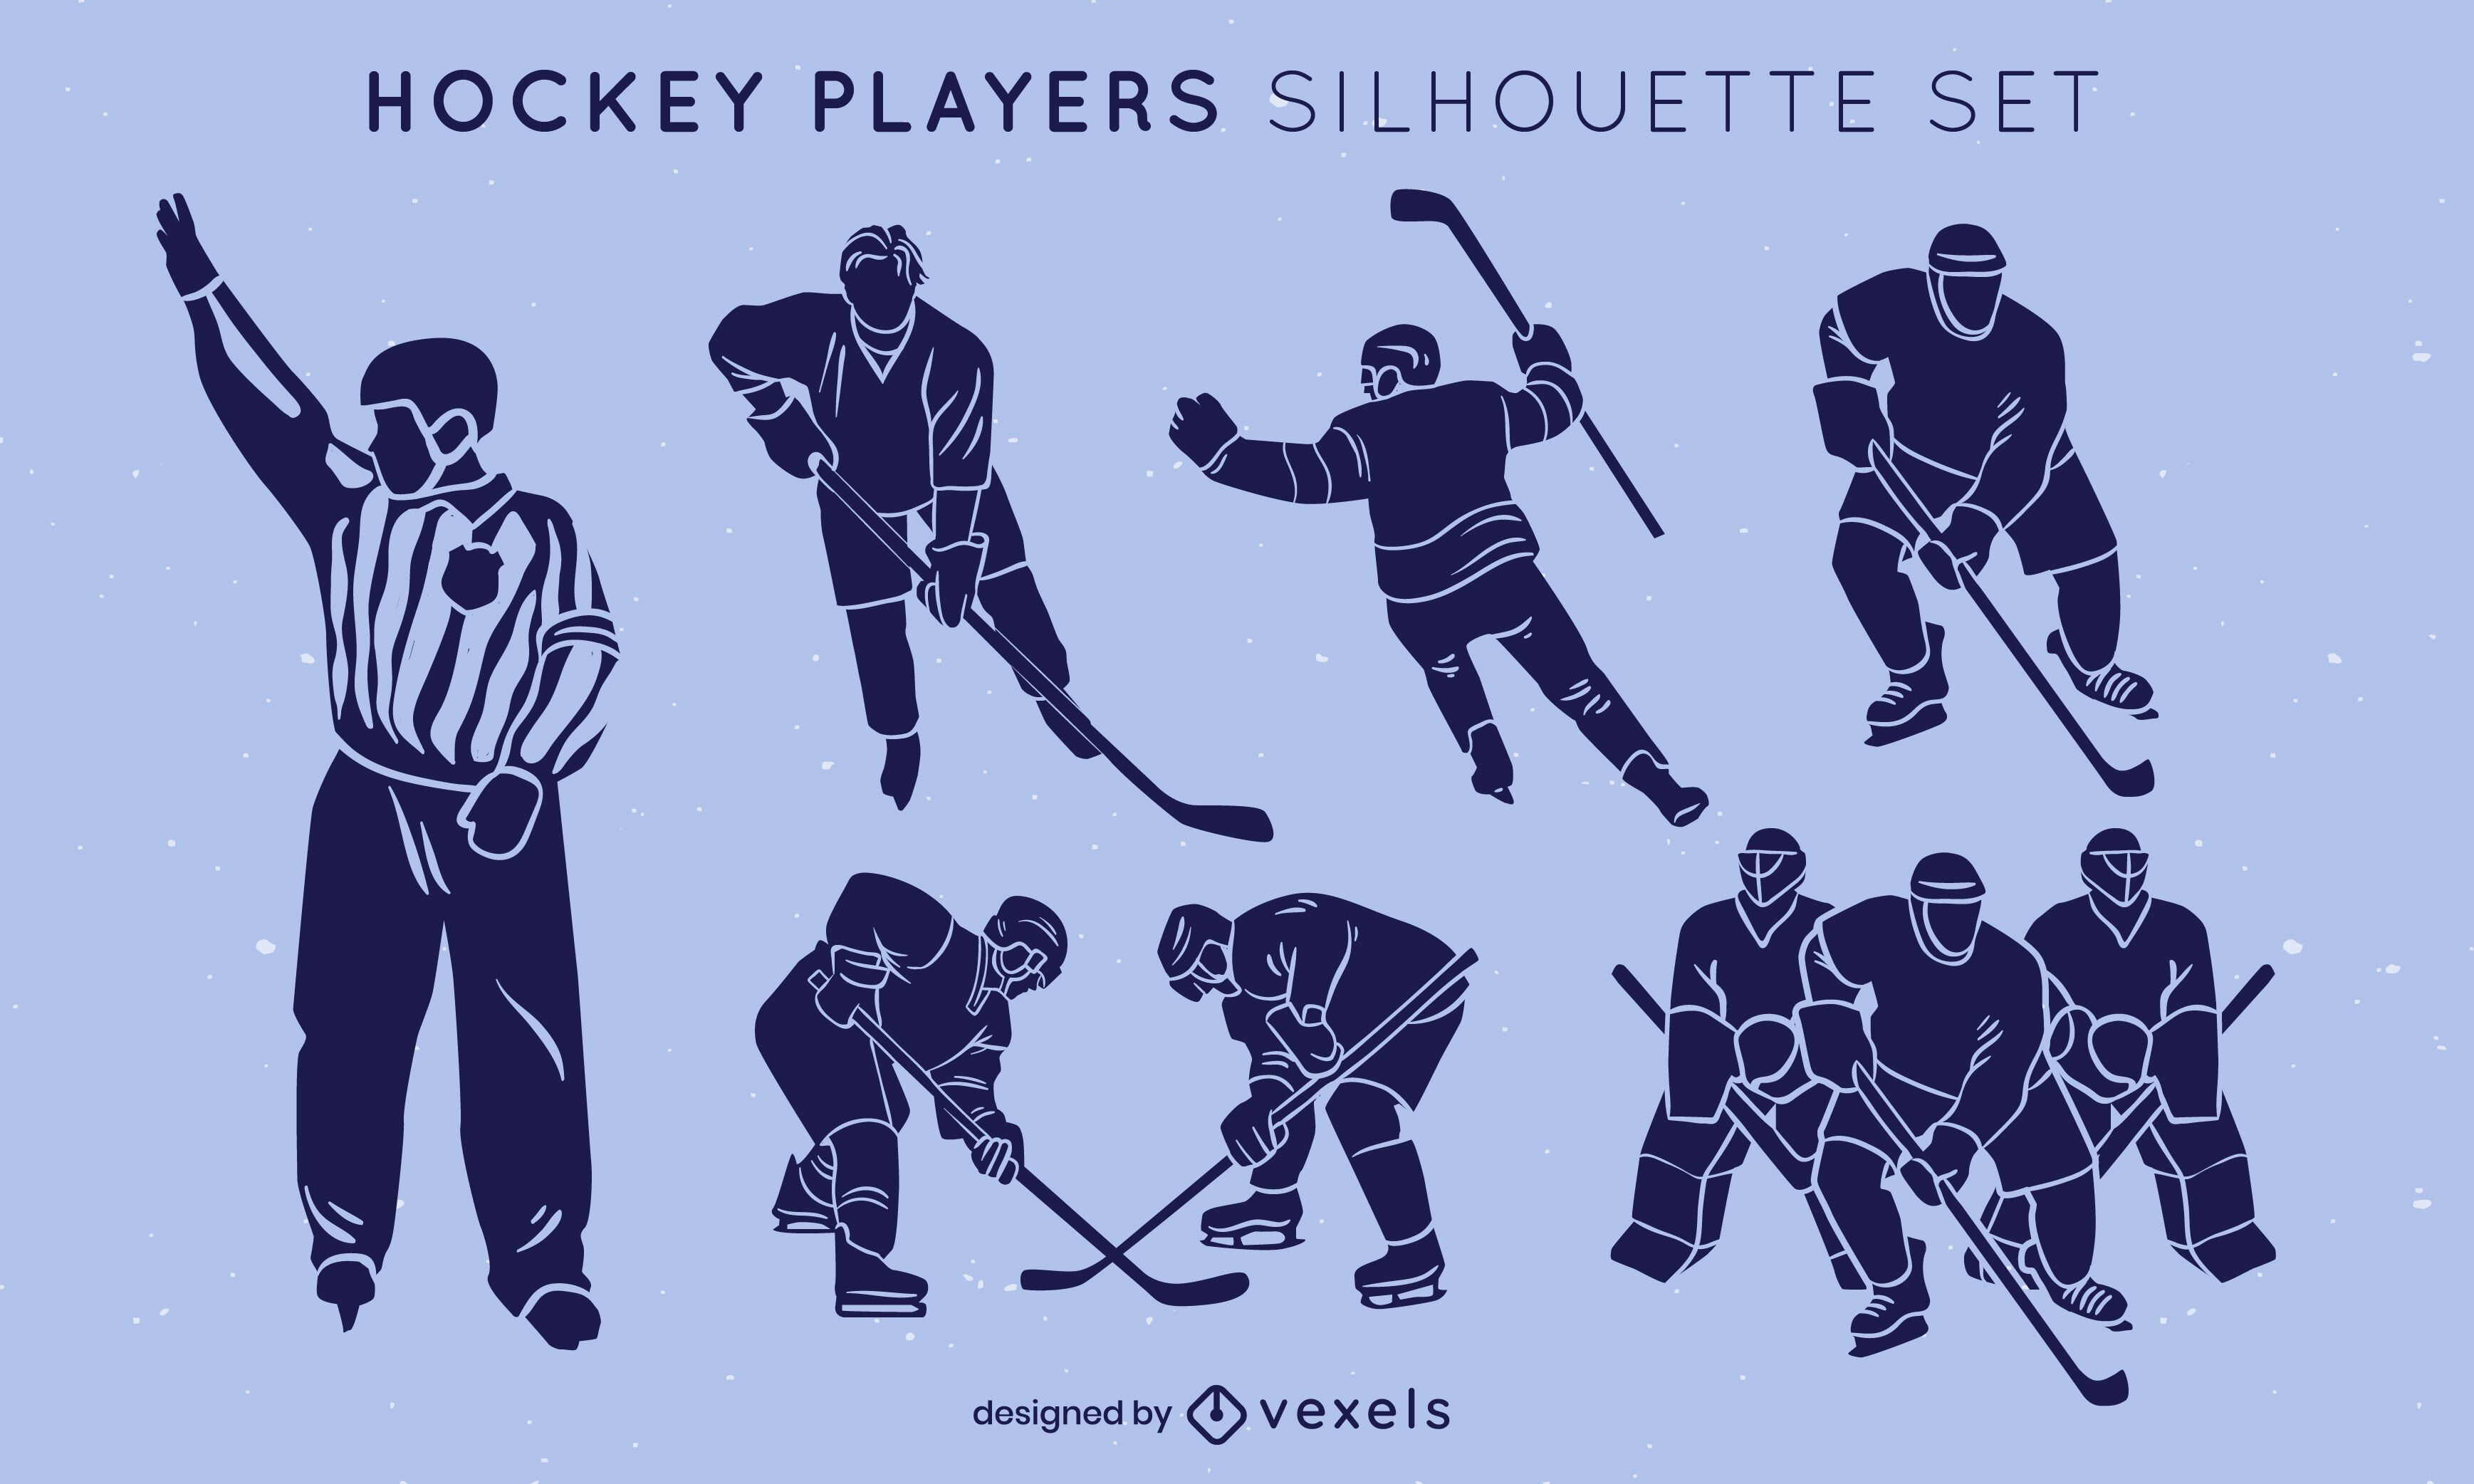 Jogadores de hóquei no gelo posam conjunto de silhueta de esporte